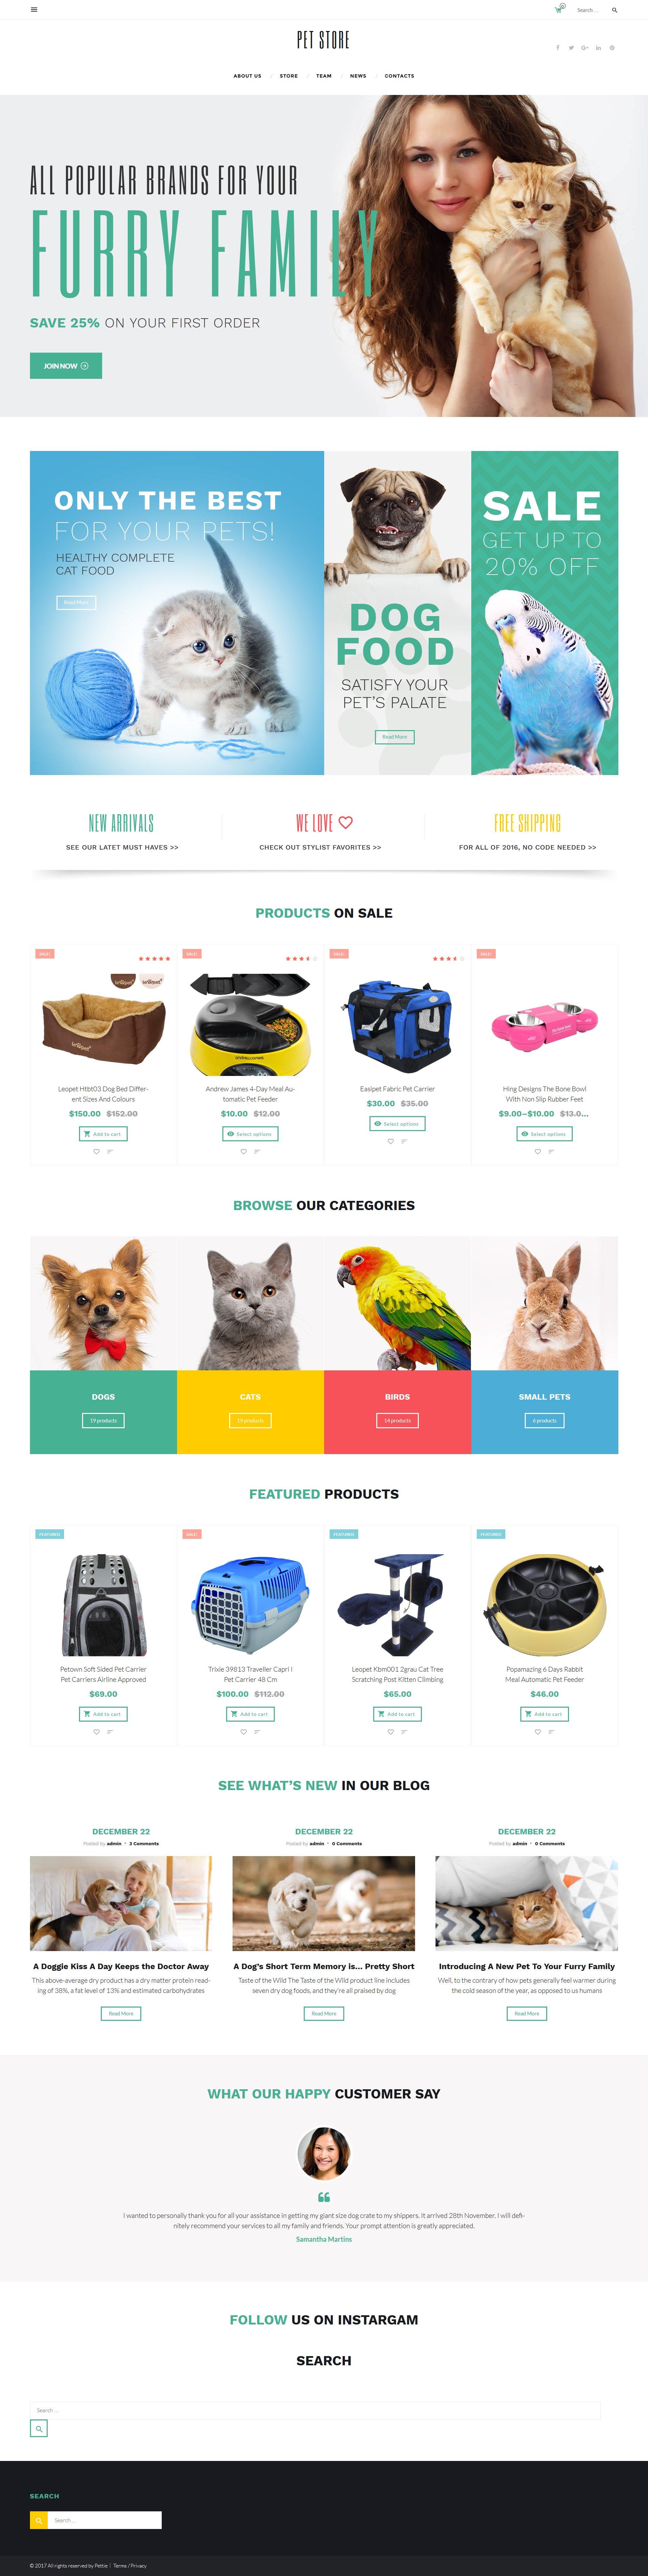 Responsive PetStore - Pets Supplies Shop Responsive WooCommerce Theme #58660 - Ekran resmi